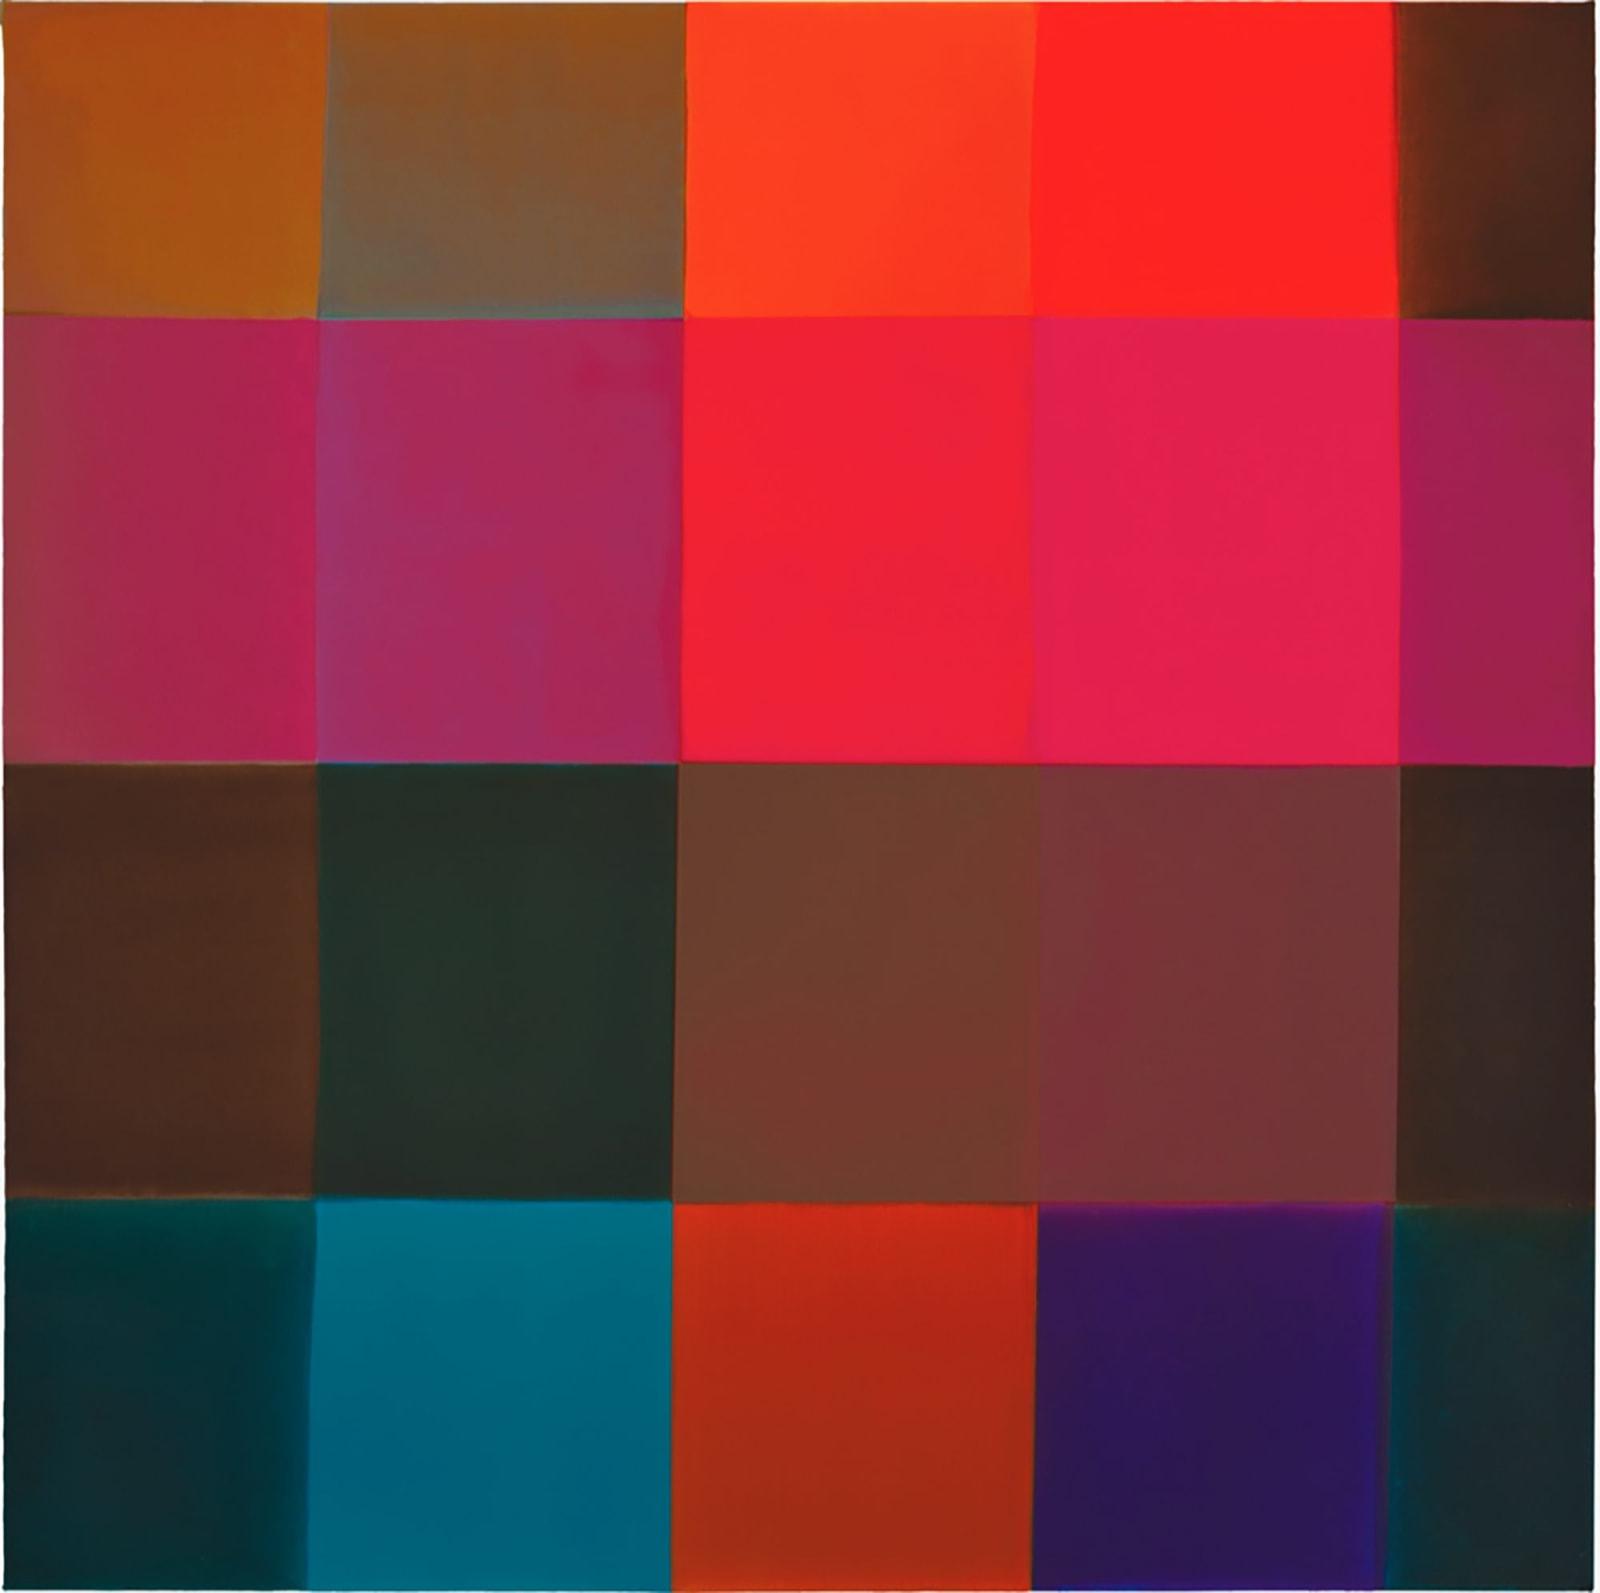 PINKORANGEBLUEBROWN, 2017 Acrylic on canvas mounted on wood panel 36 x 36 in 91.4 x 91.4 cm HS 51